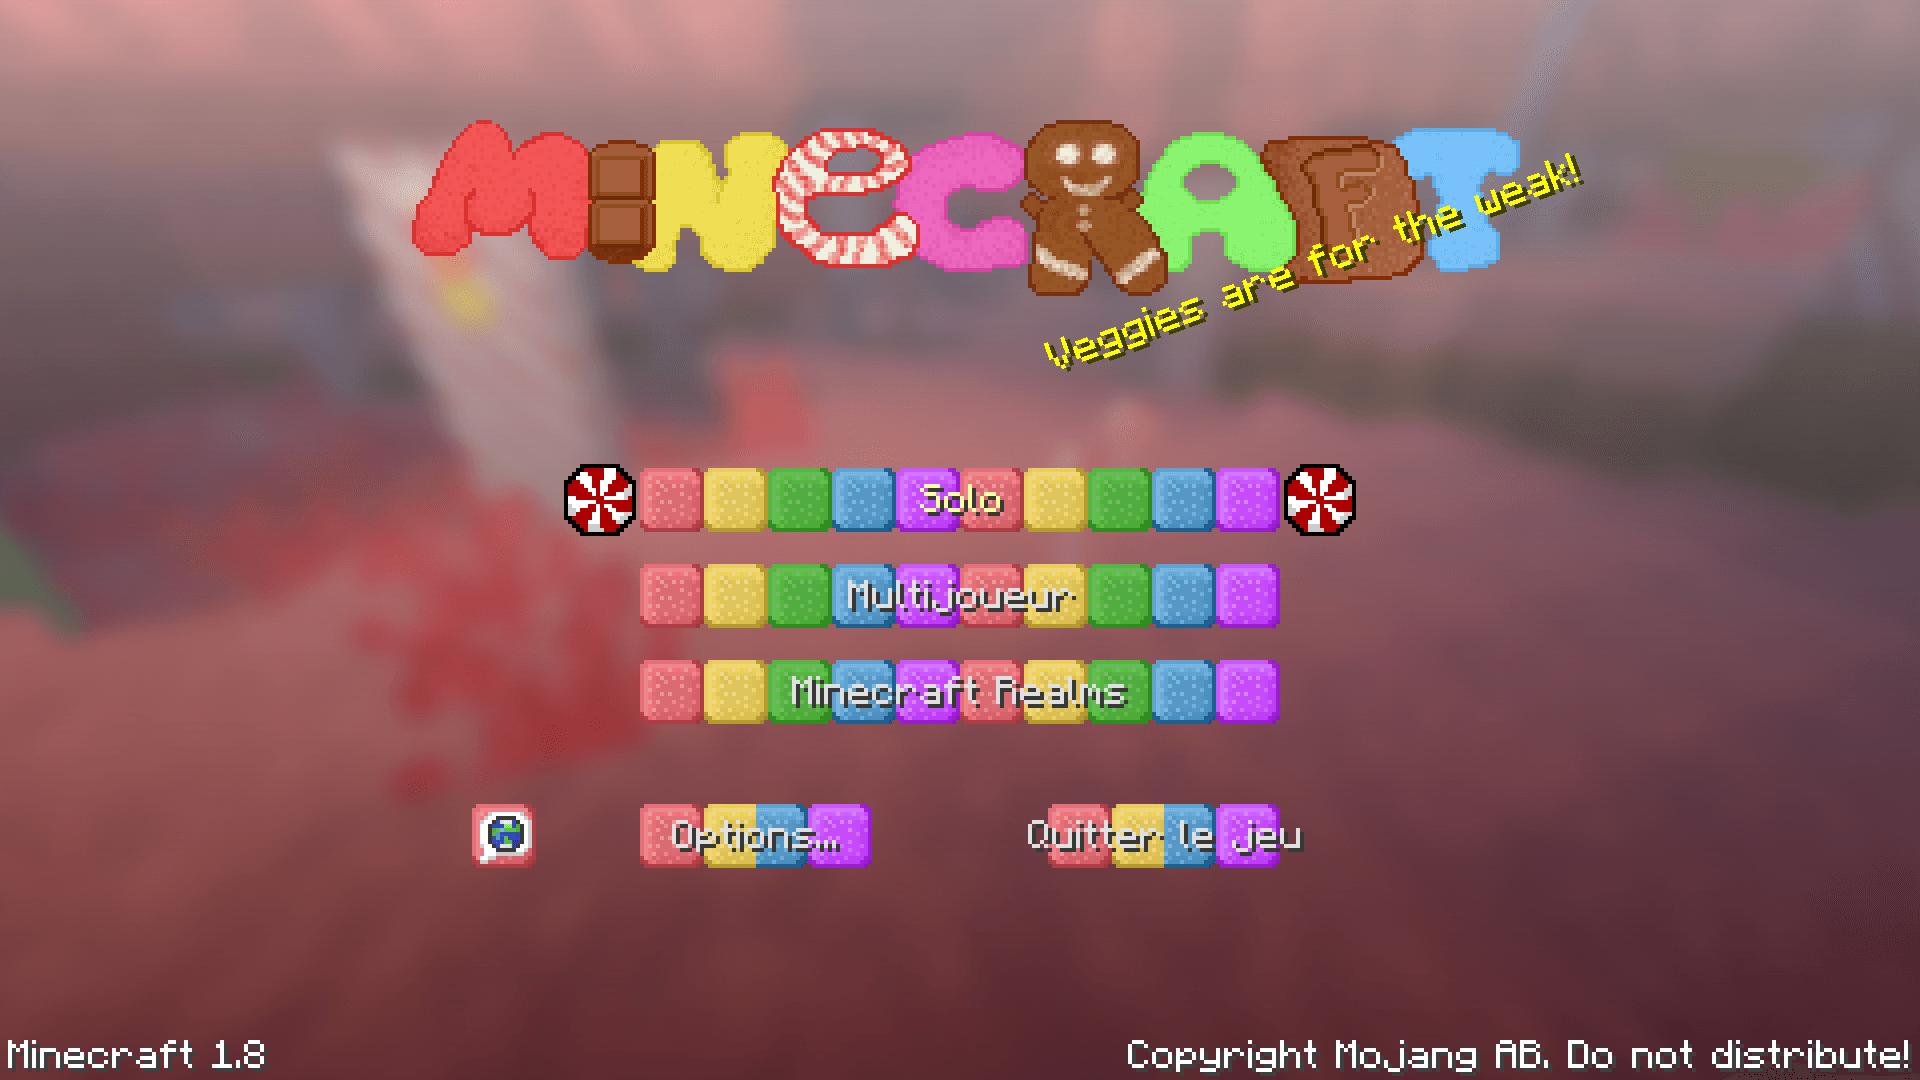 L'accueil de Minecraft avec Sugar pack